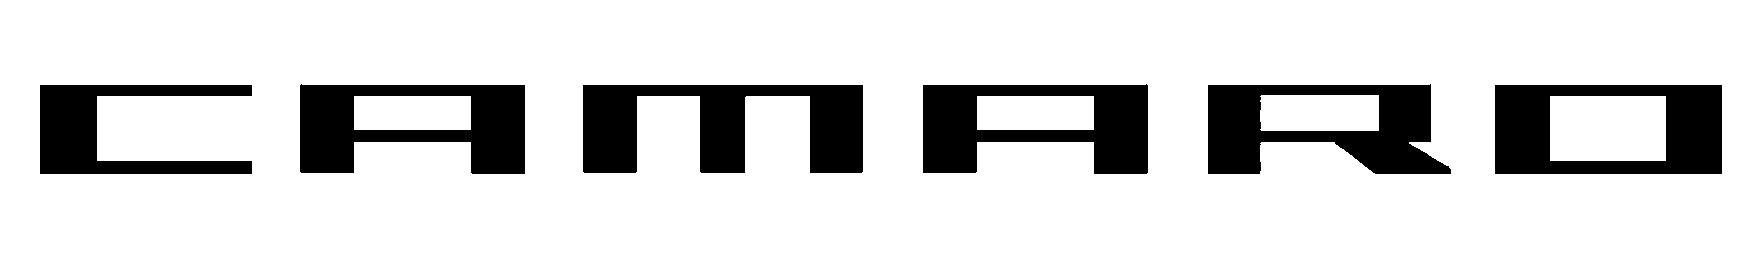 13 camaro logo font images camaro logo vector camaro ss logo rh newdesignfile com camaro logo font camaro logo seat covers